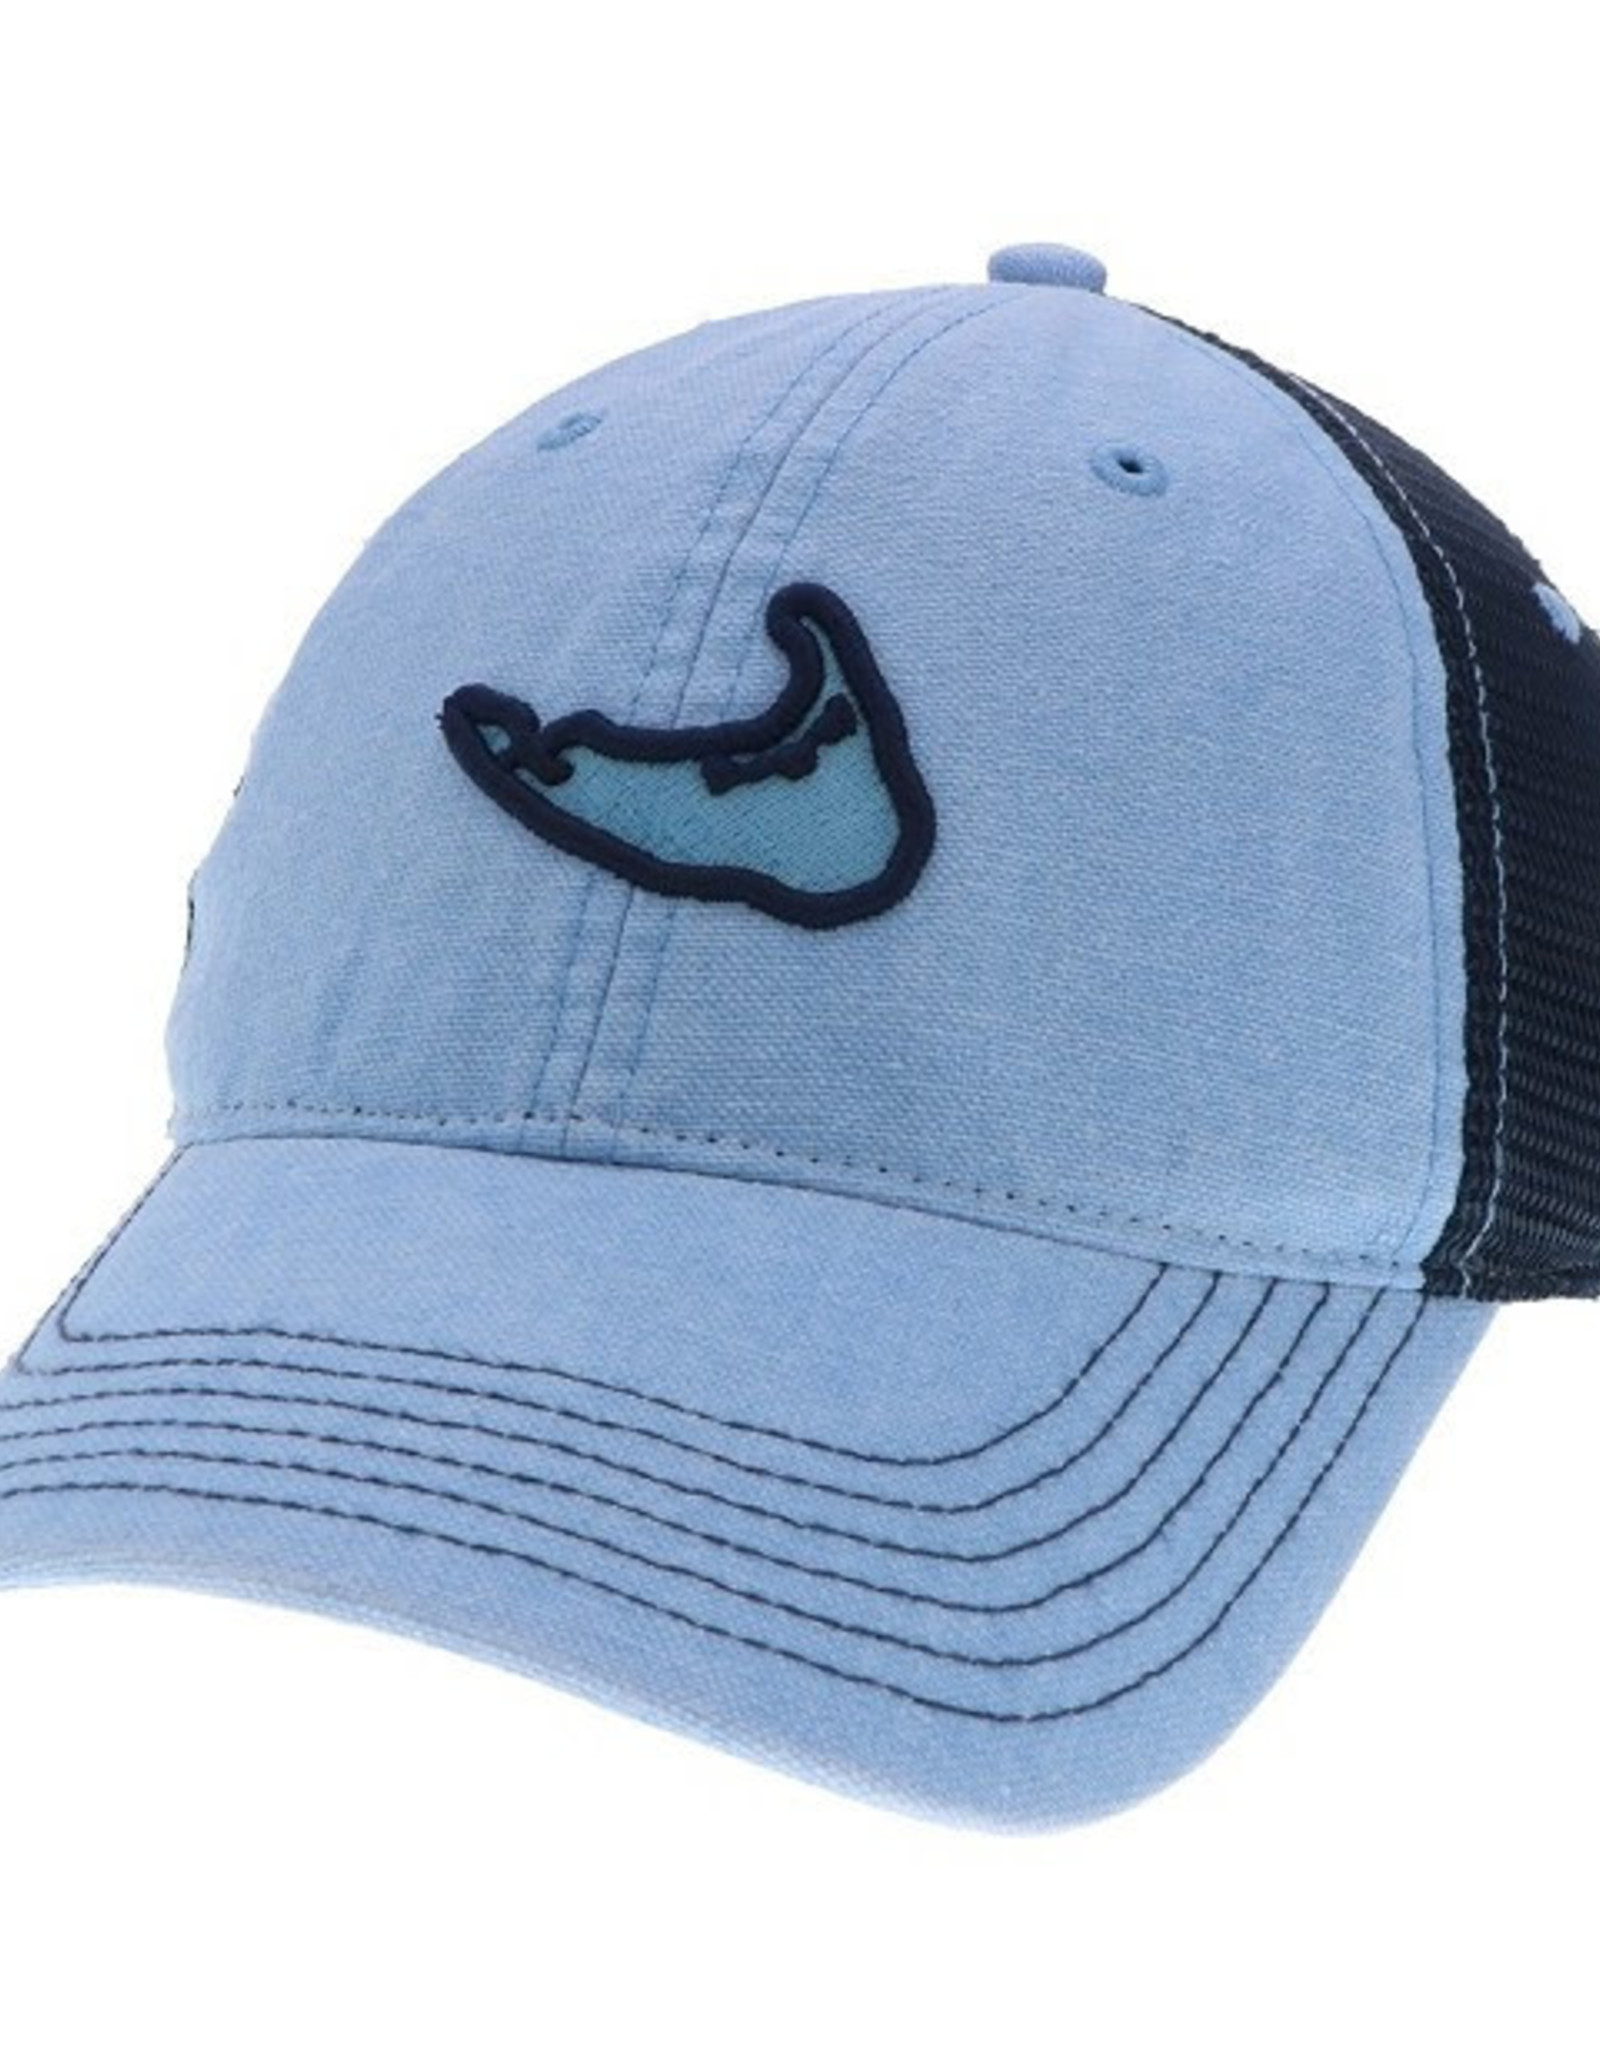 Legacy Legacy Trucker Hat Island Outline